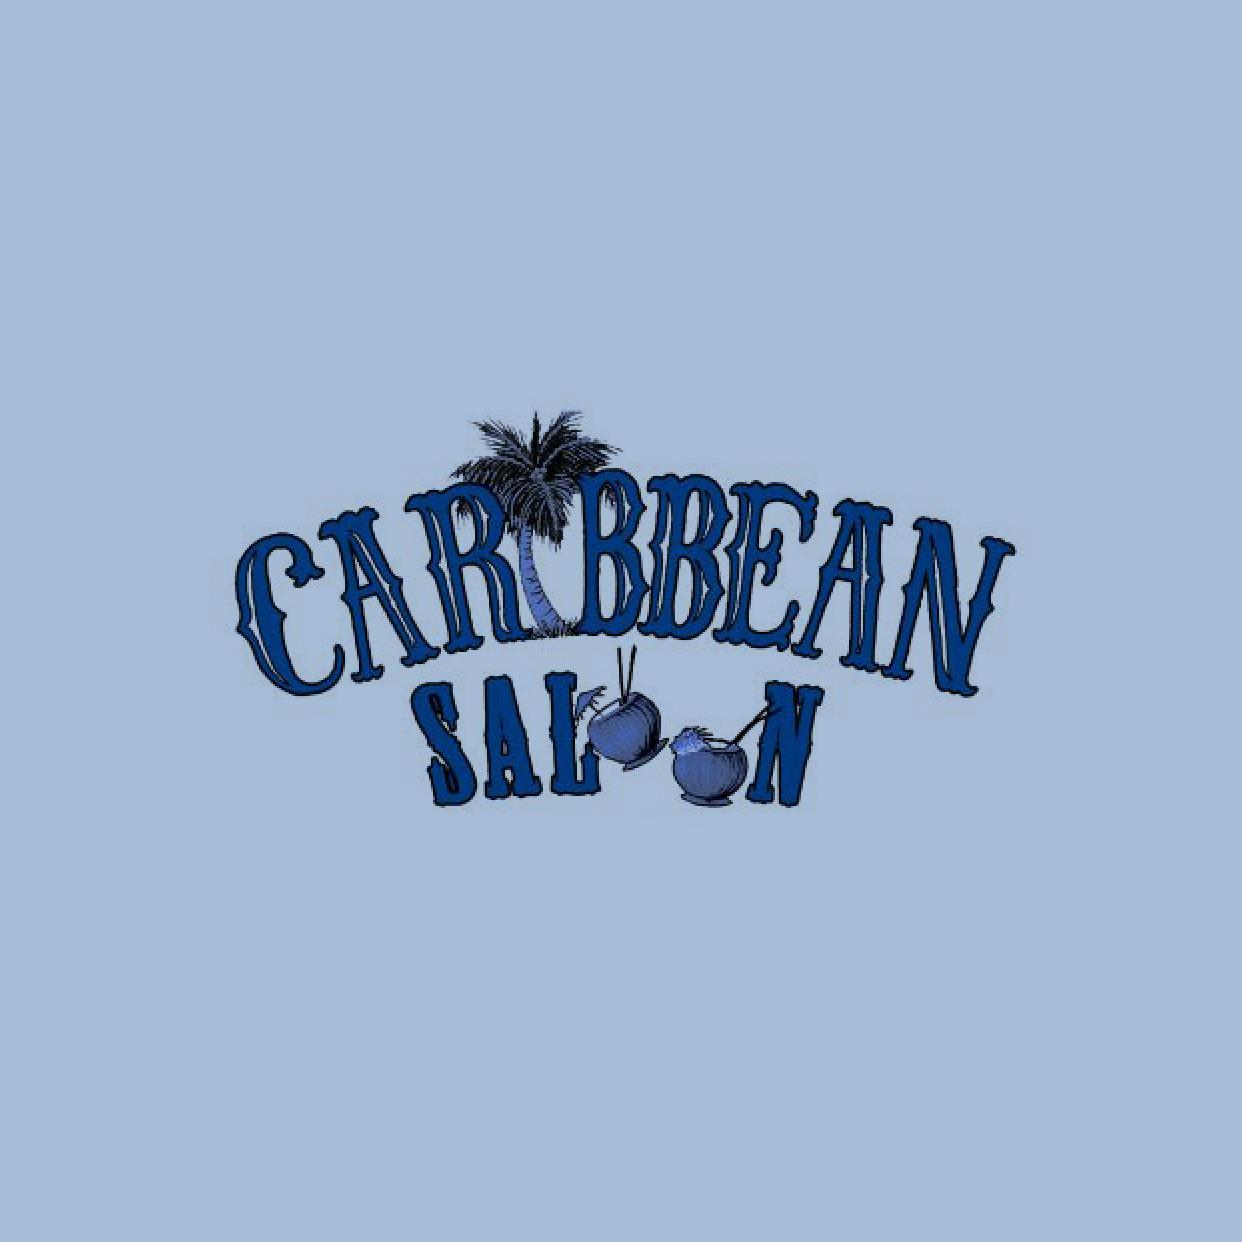 Caribbean Saloon